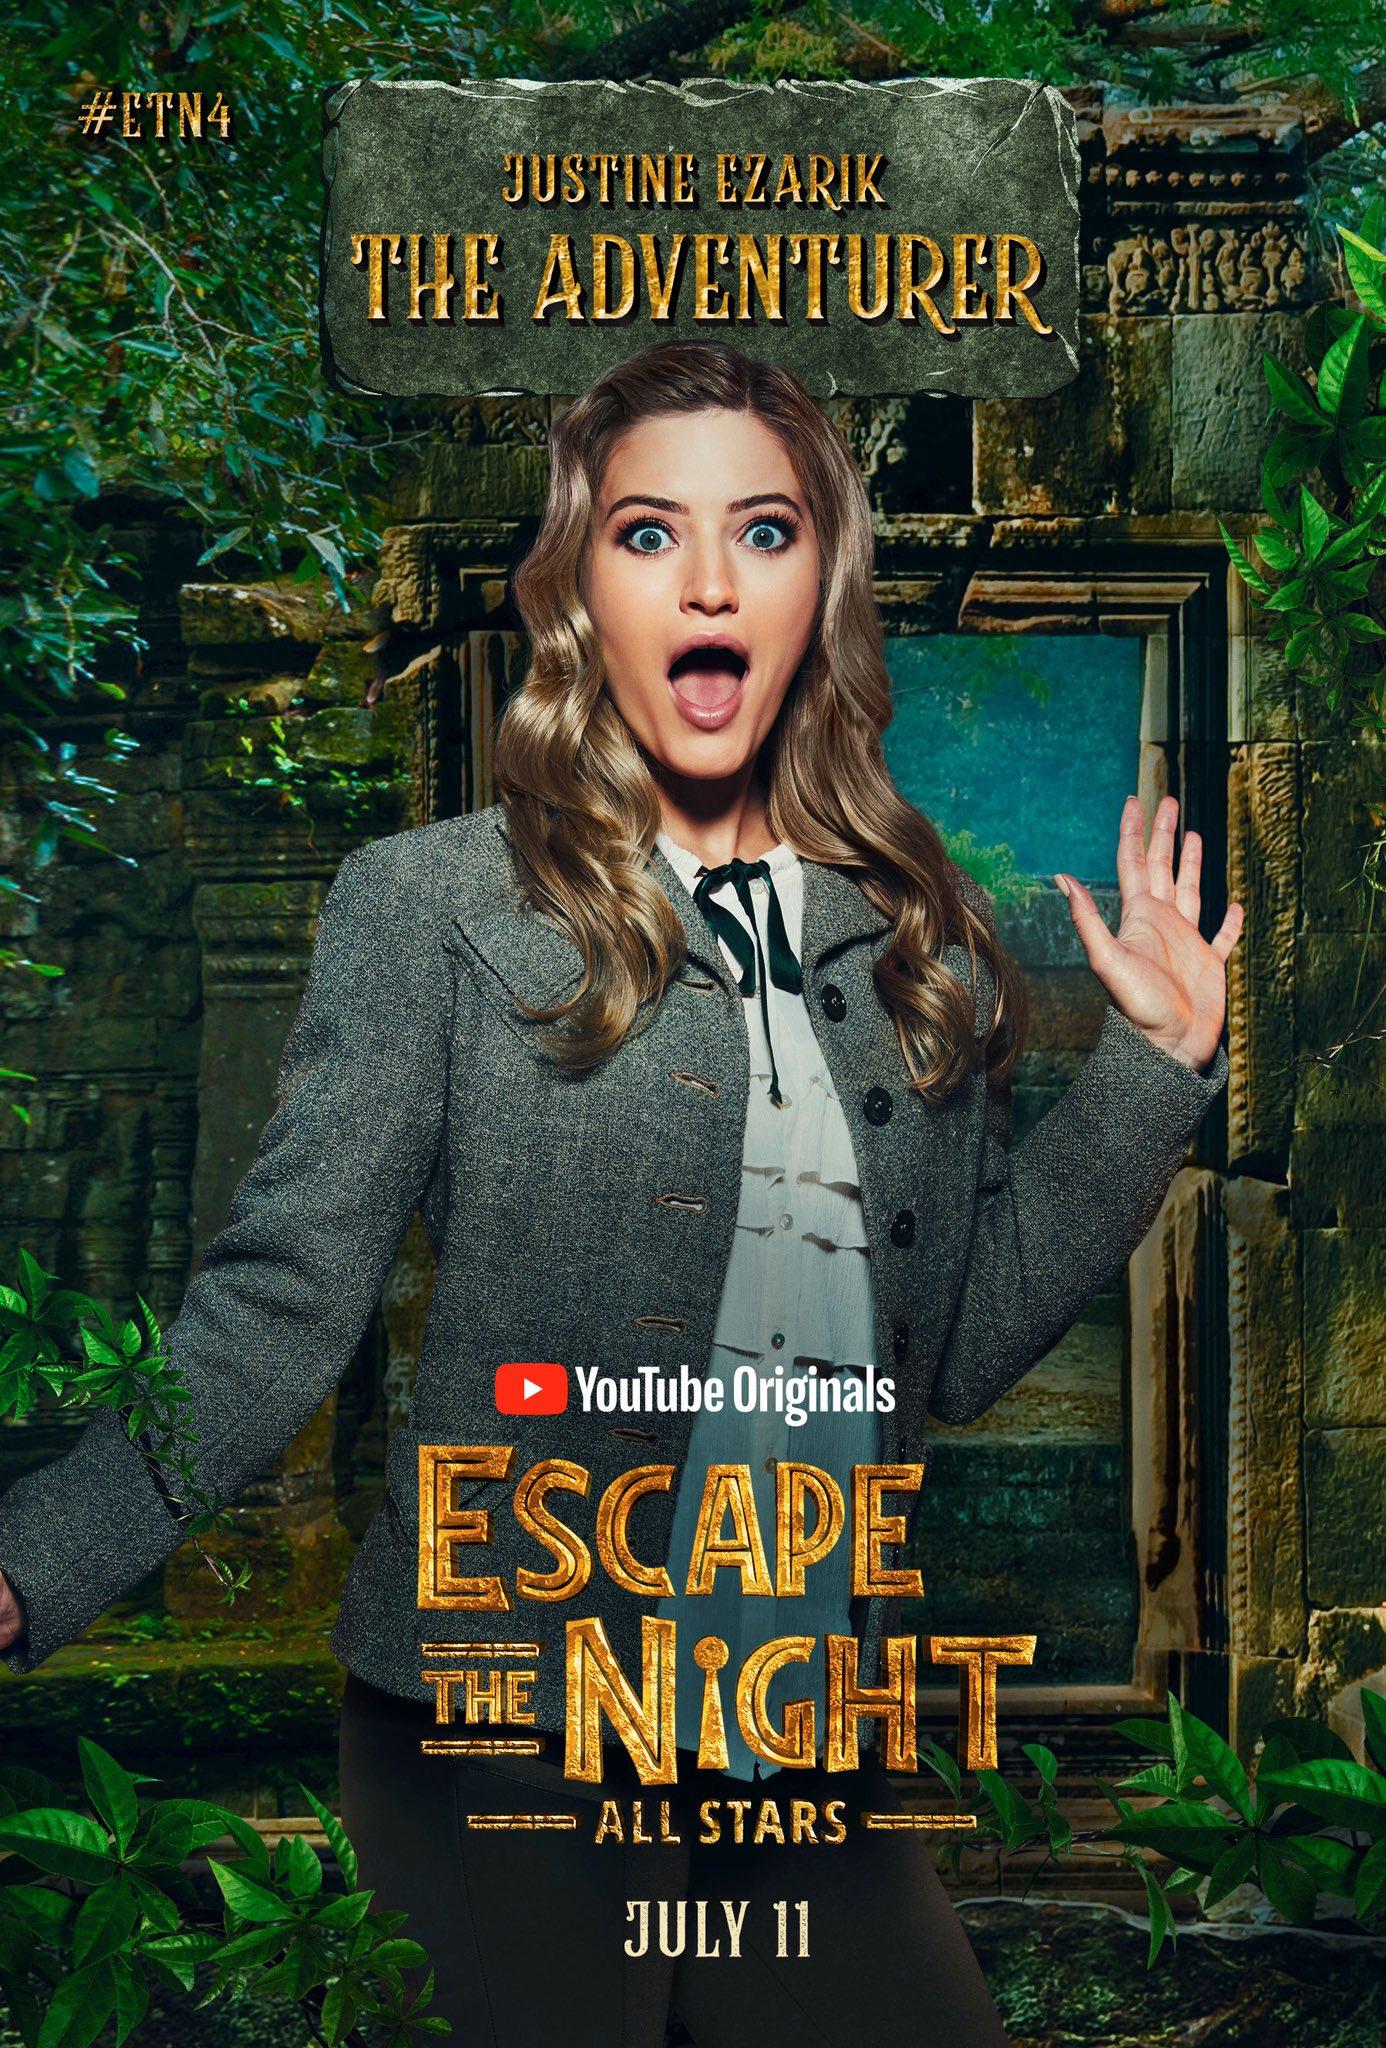 Justine Ezarik - The Adventurer - Escape the Night Photo (42858302